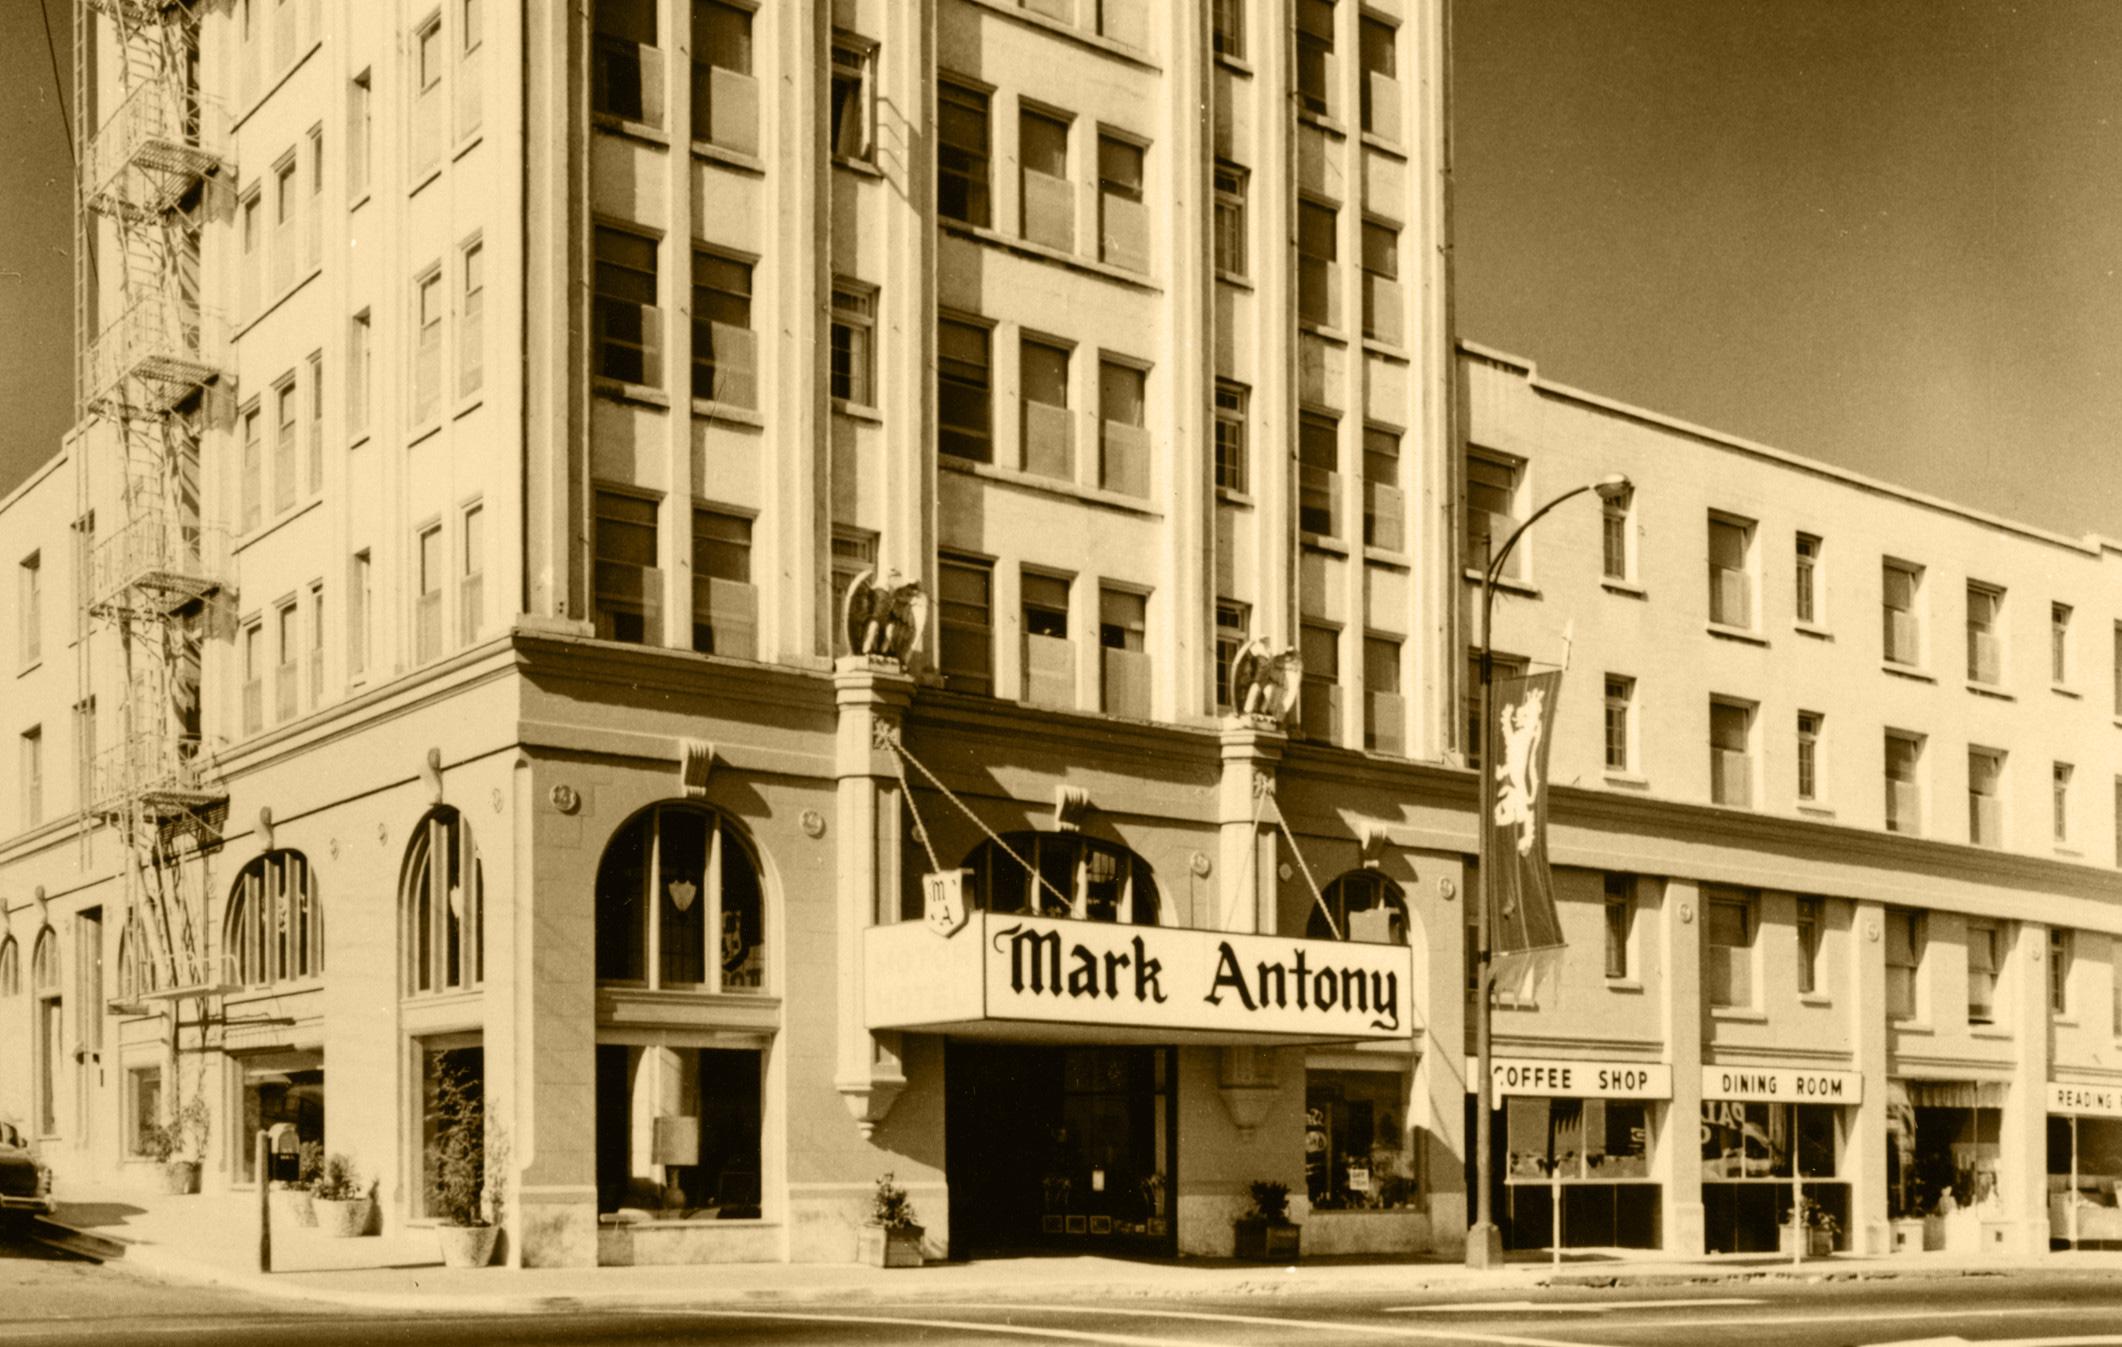 Ashland Springs Hotel - Vintage